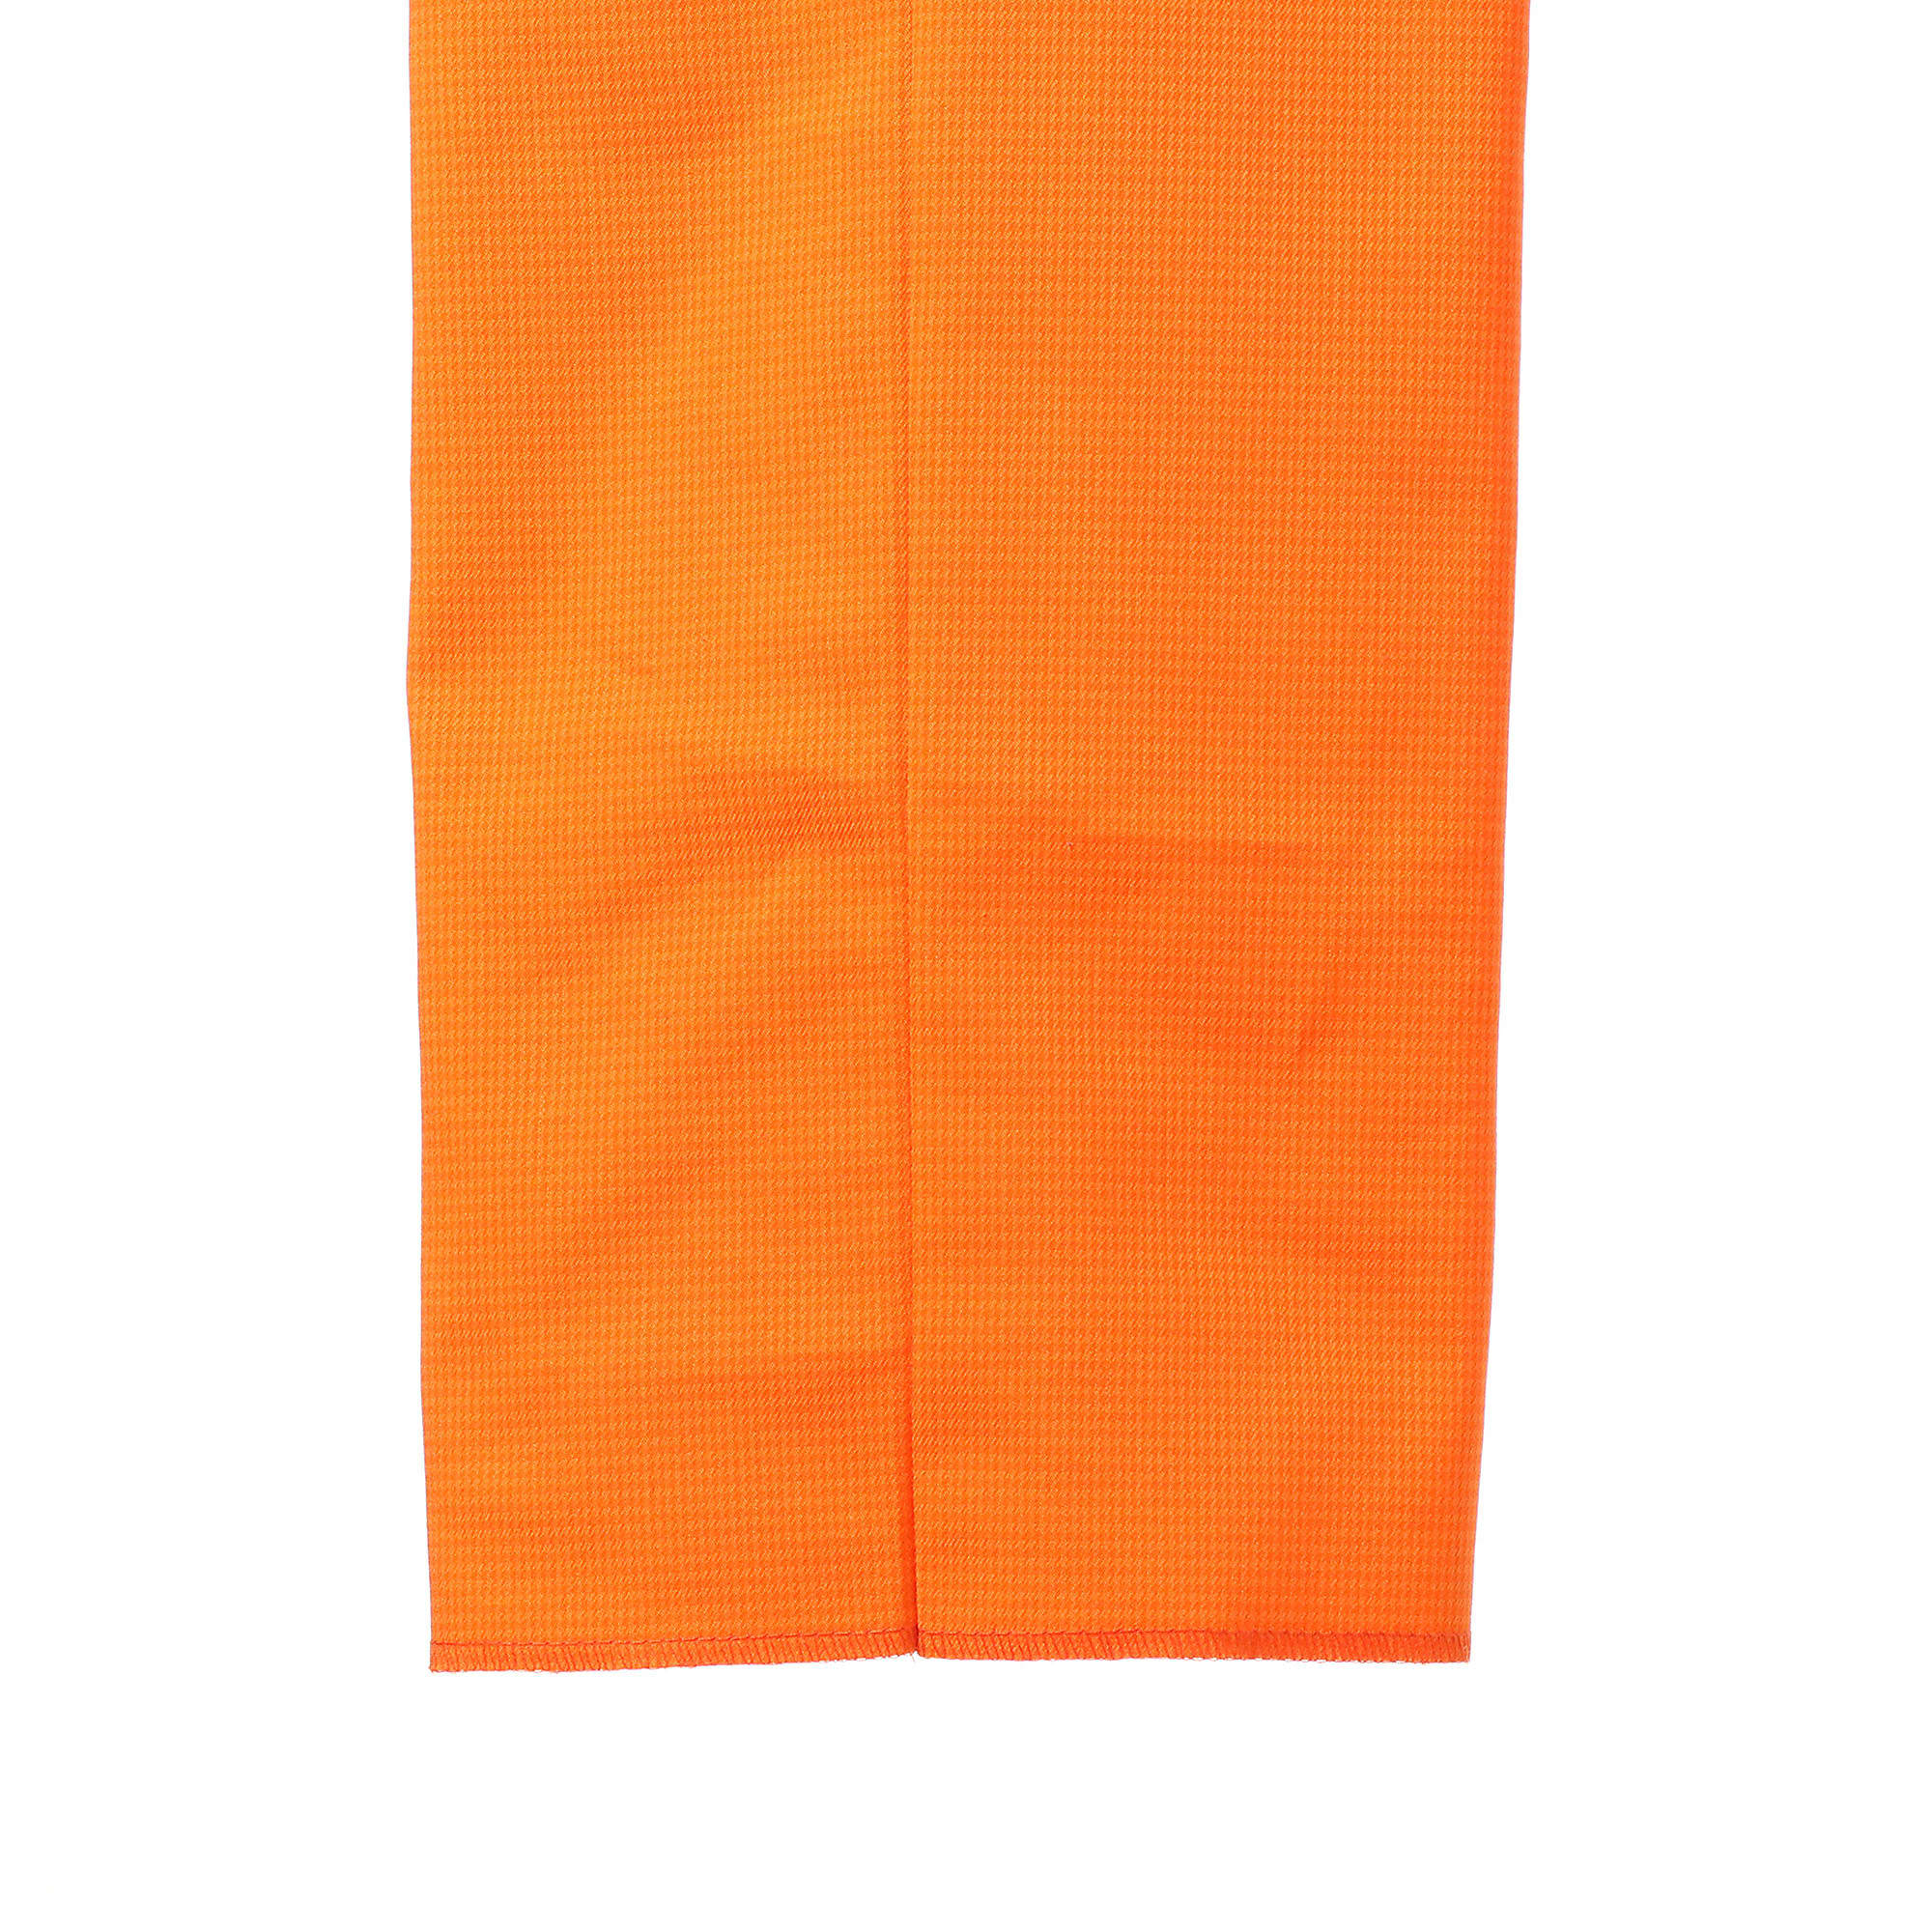 Thumbnail 6 of ゴルフ フュージョン 3Dテーパードパンツ, Vibrant Orange, medium-JPN